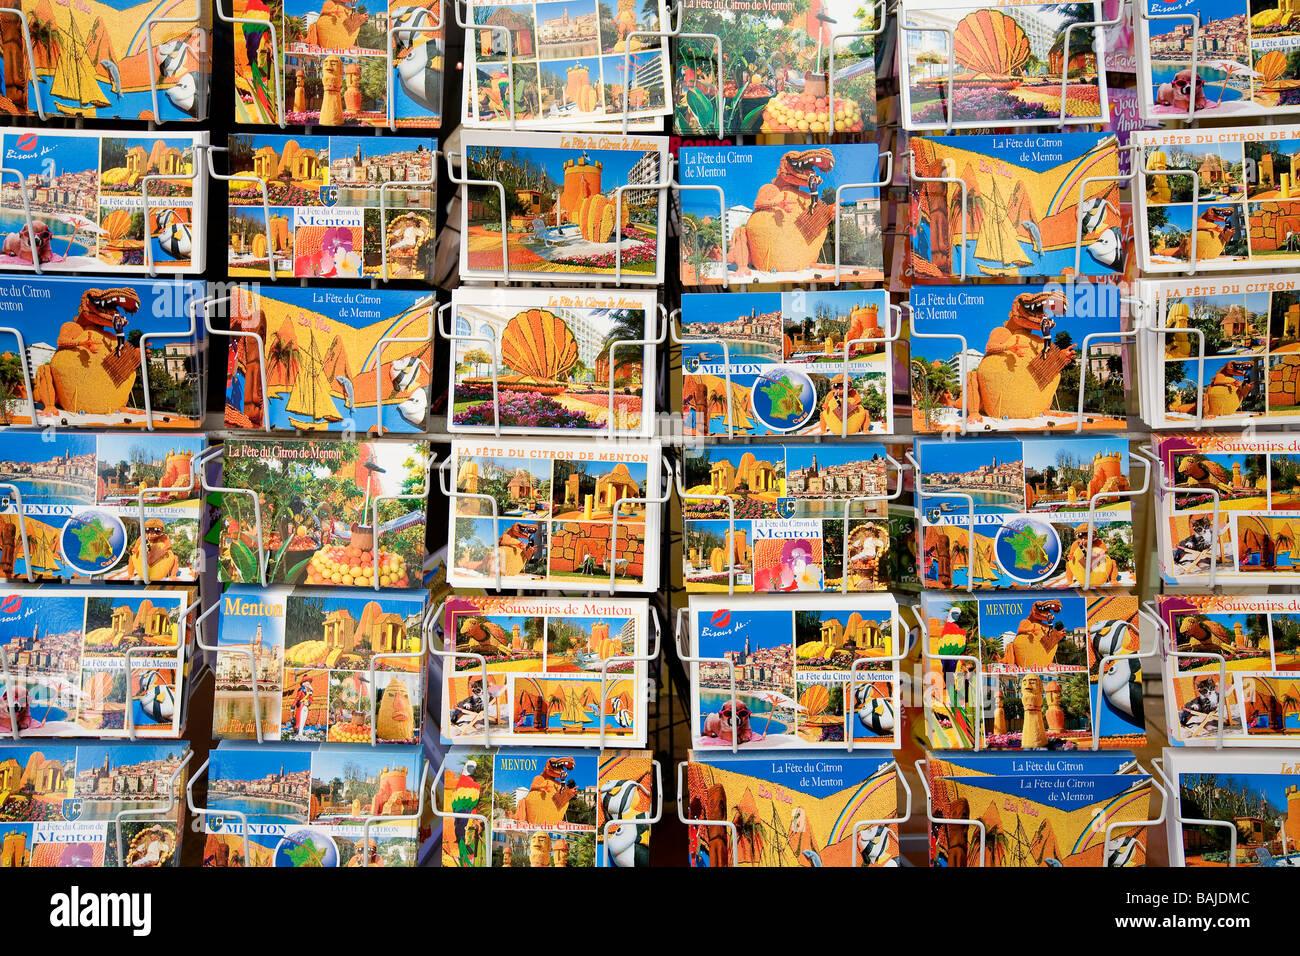 France, Alpes Maritimes, Menton,  the Fete du Citron (Lemon Festival) 2008,  theme the islands of the world, postcard - Stock Image